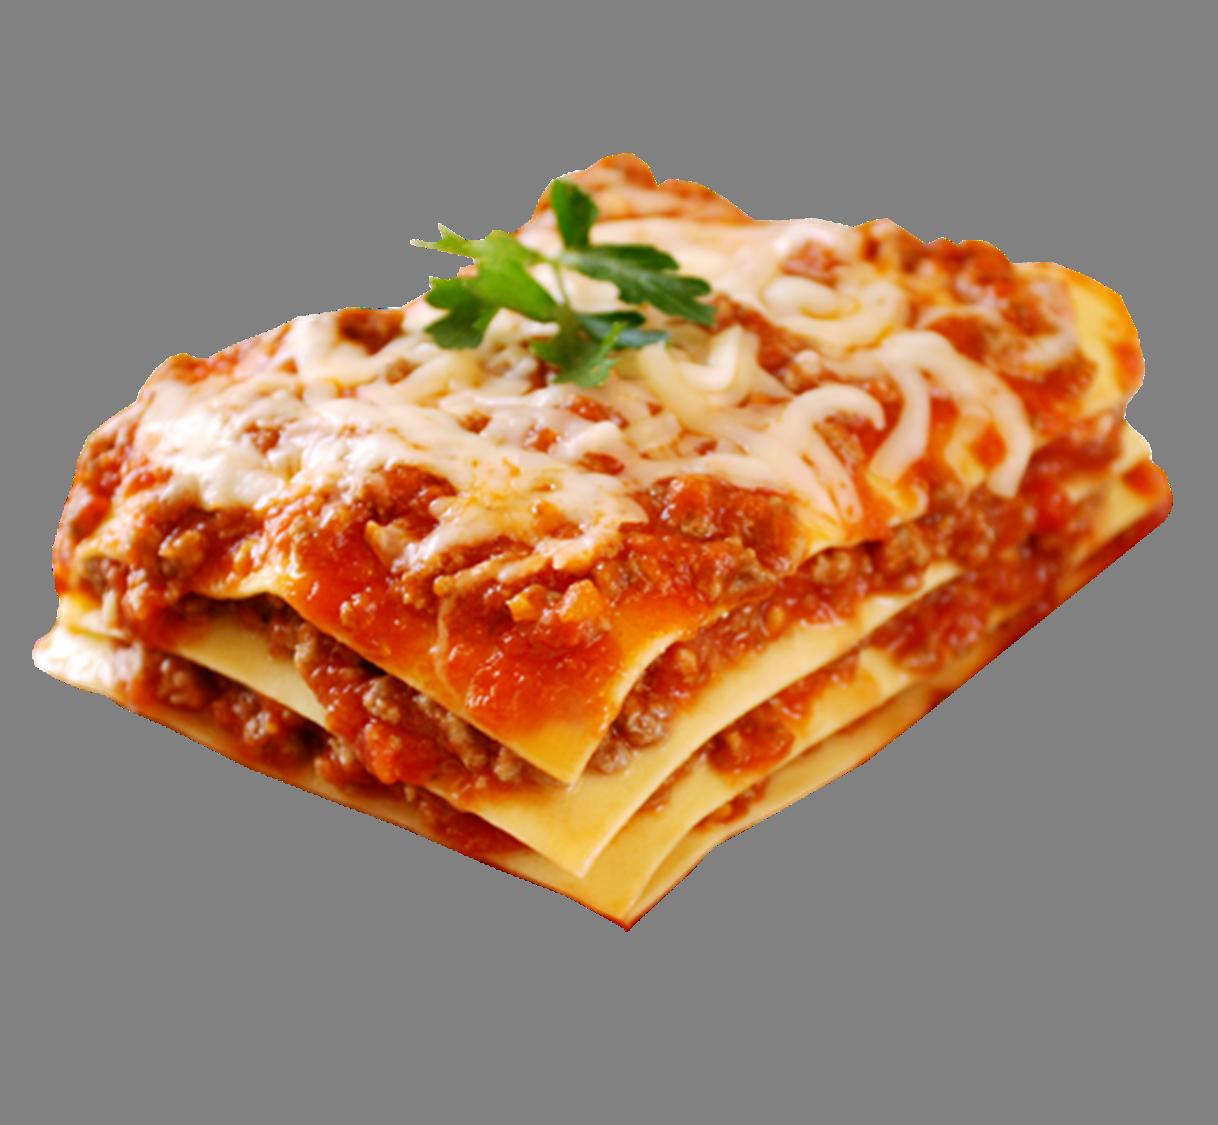 Lasagne clipart clip art freeuse download Lasagne Bolognese sauce Italian cuisine Pasta Food - kebab with rice ... clip art freeuse download